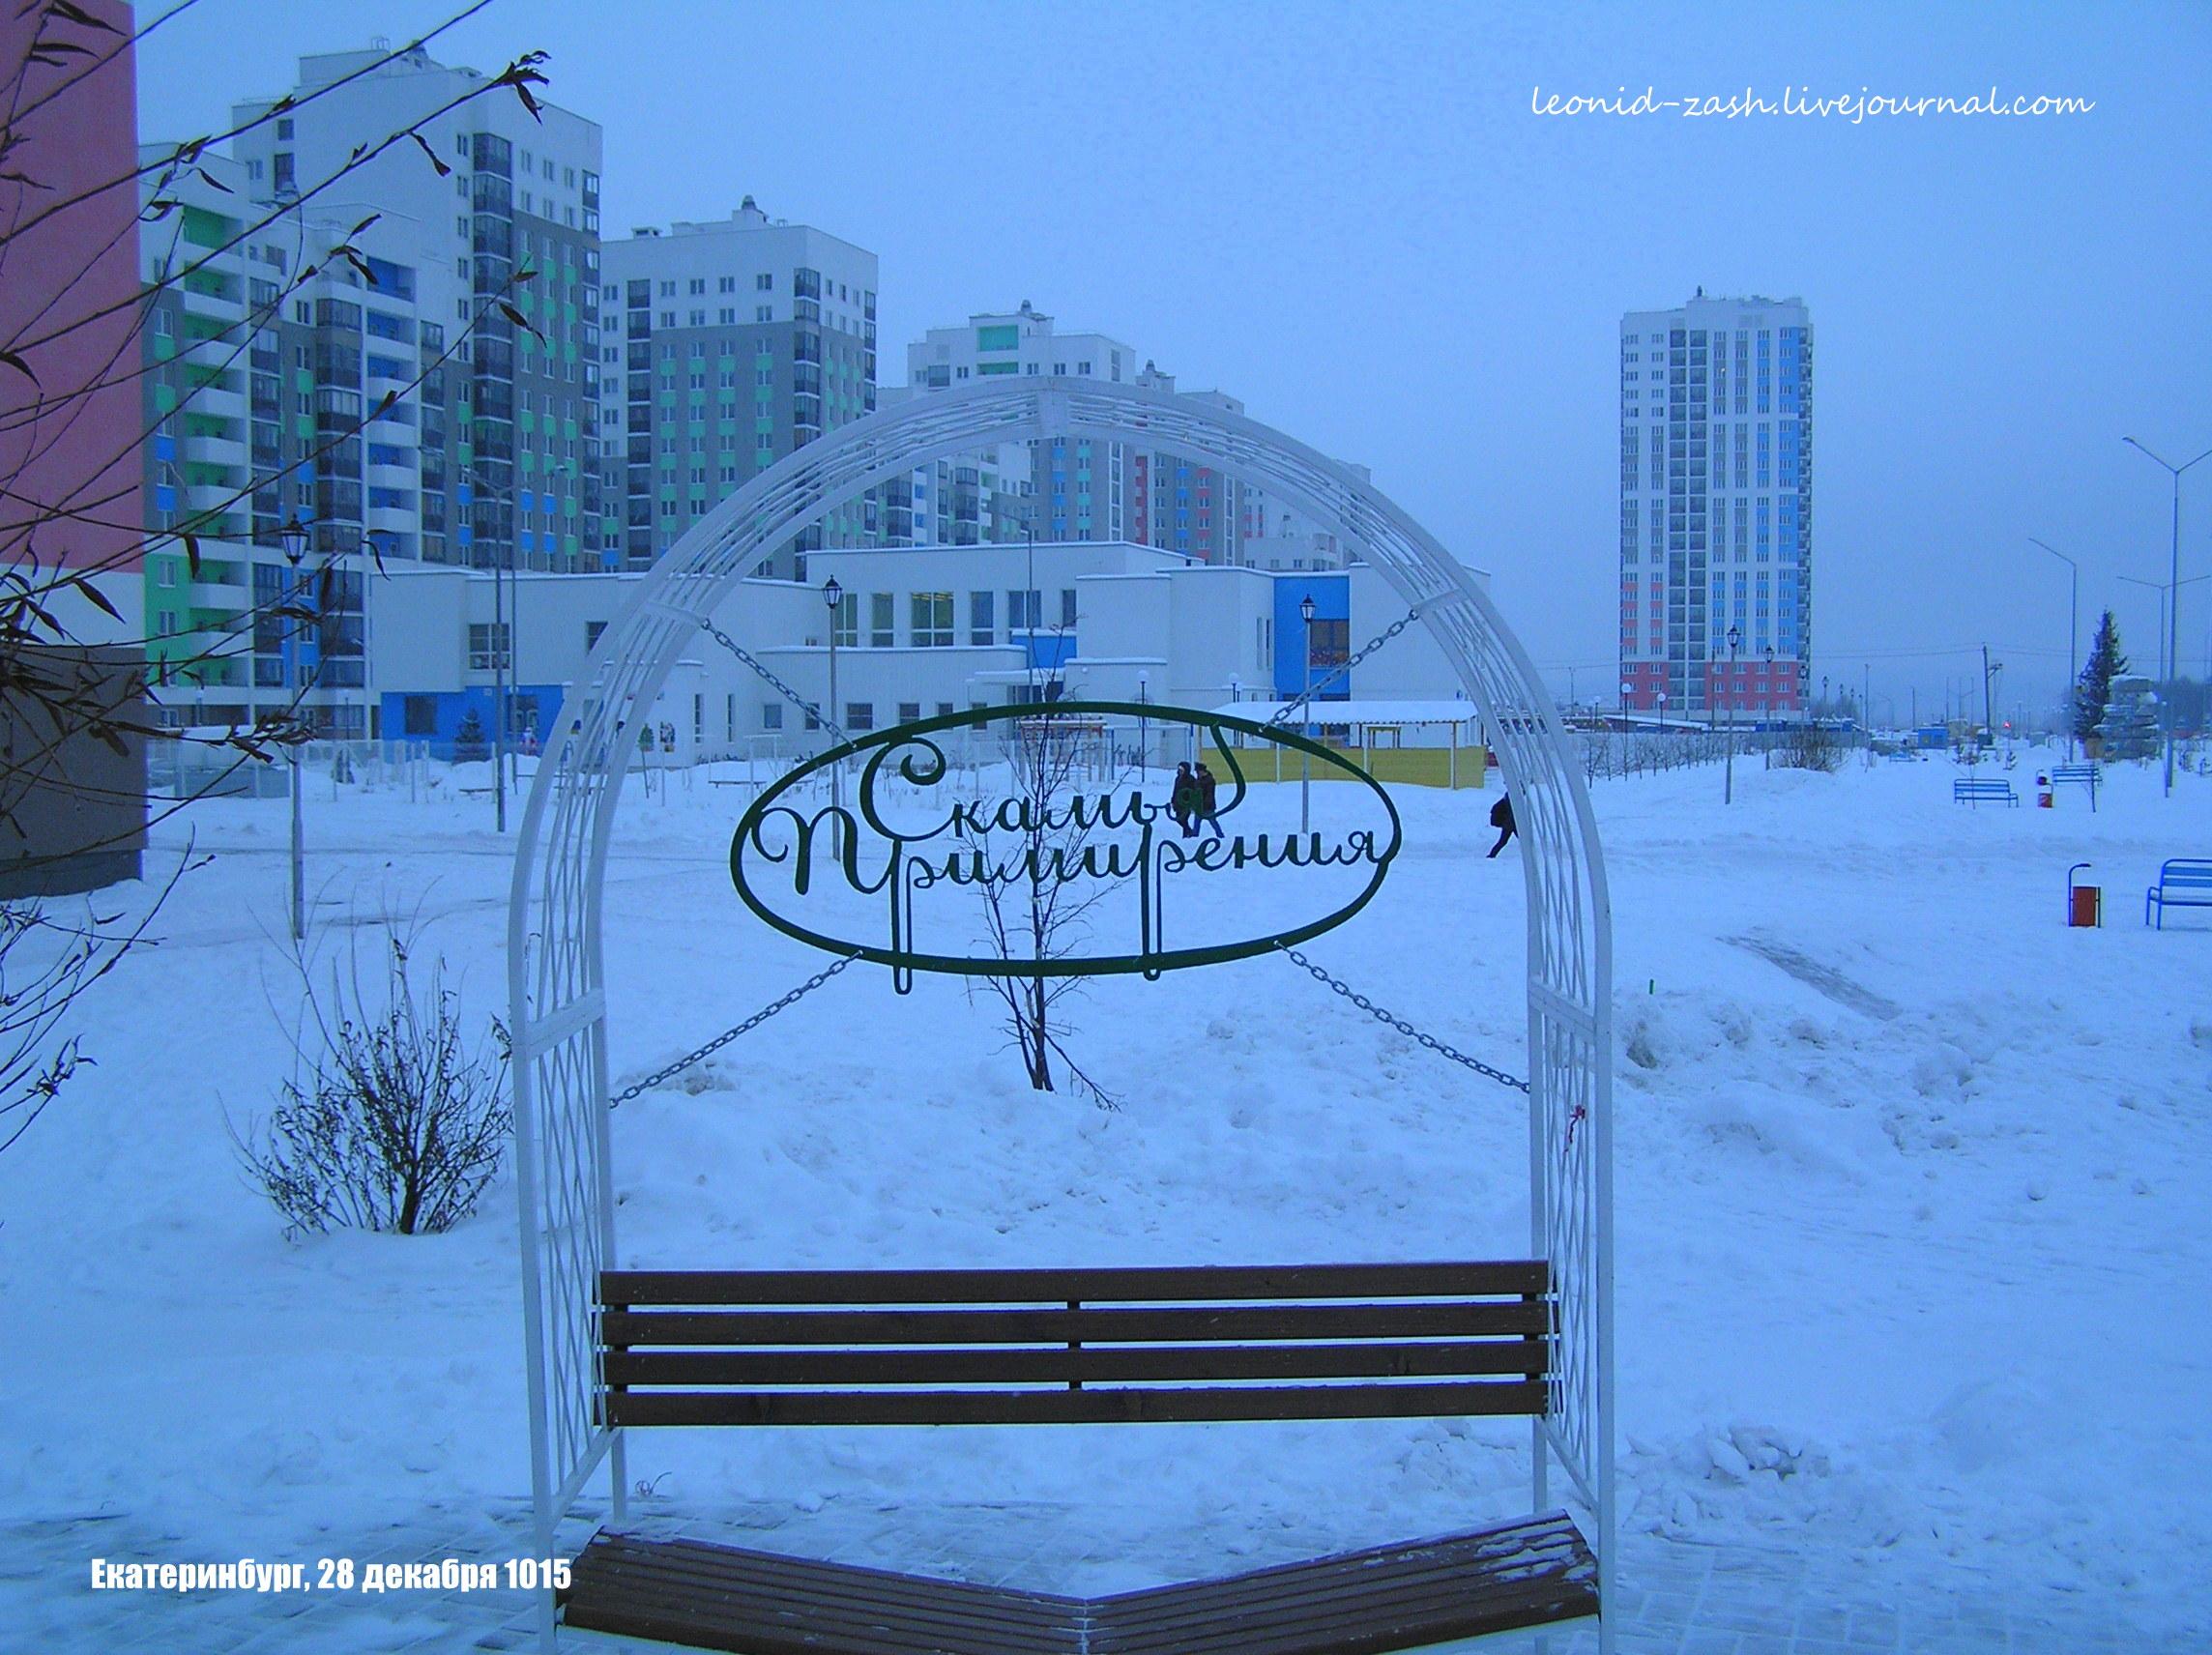 Екатеринбург Урал 21.JPG